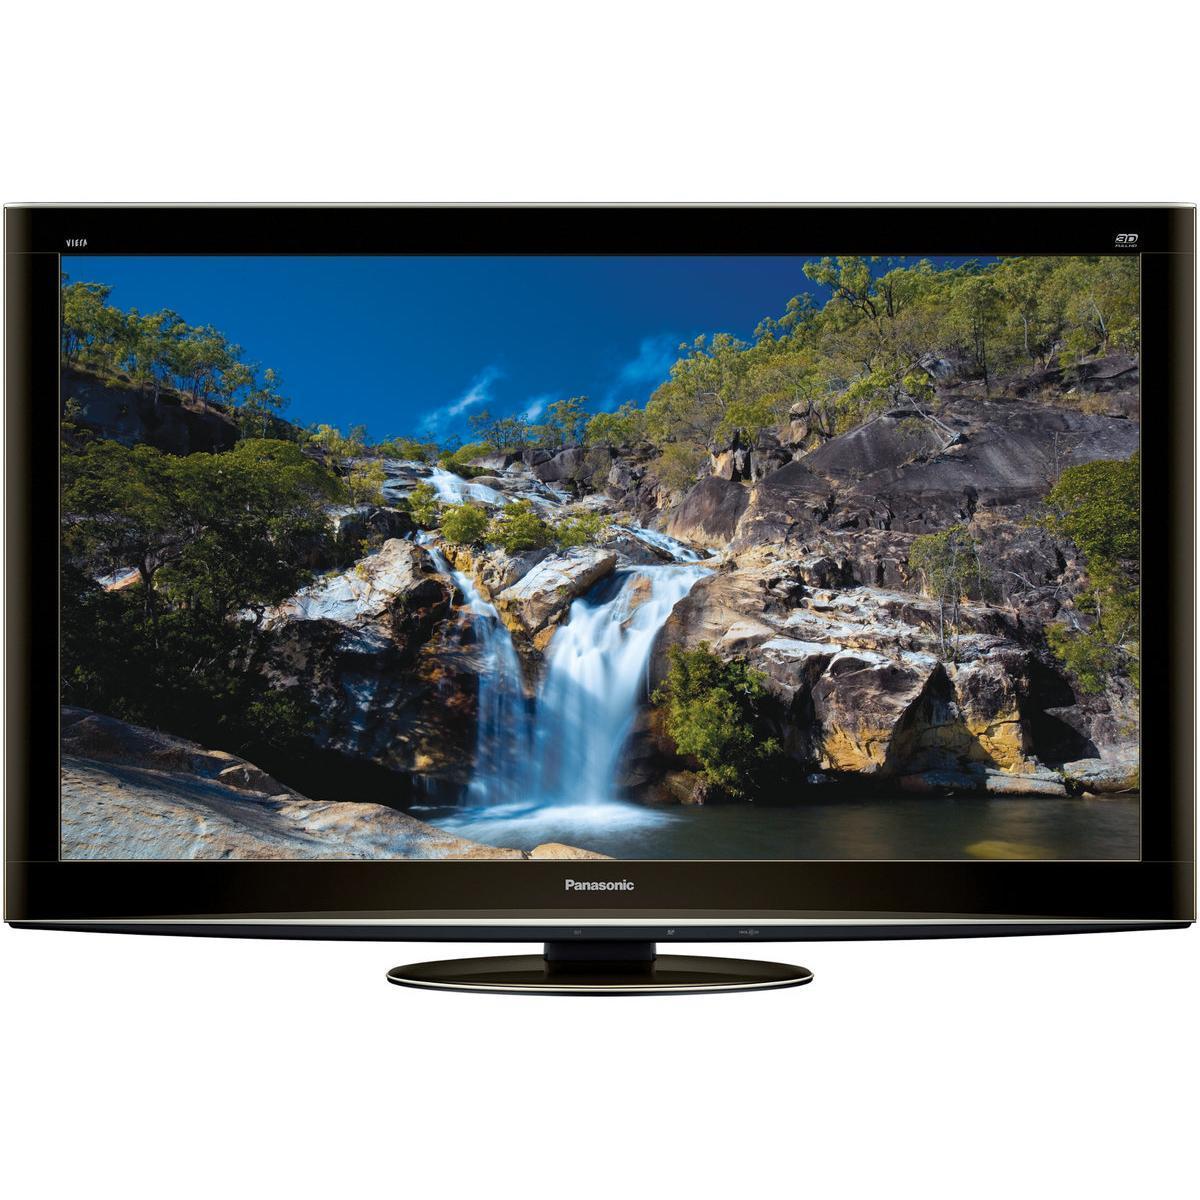 TV Panasonic Plasma TNT HD intégré - 127 cm